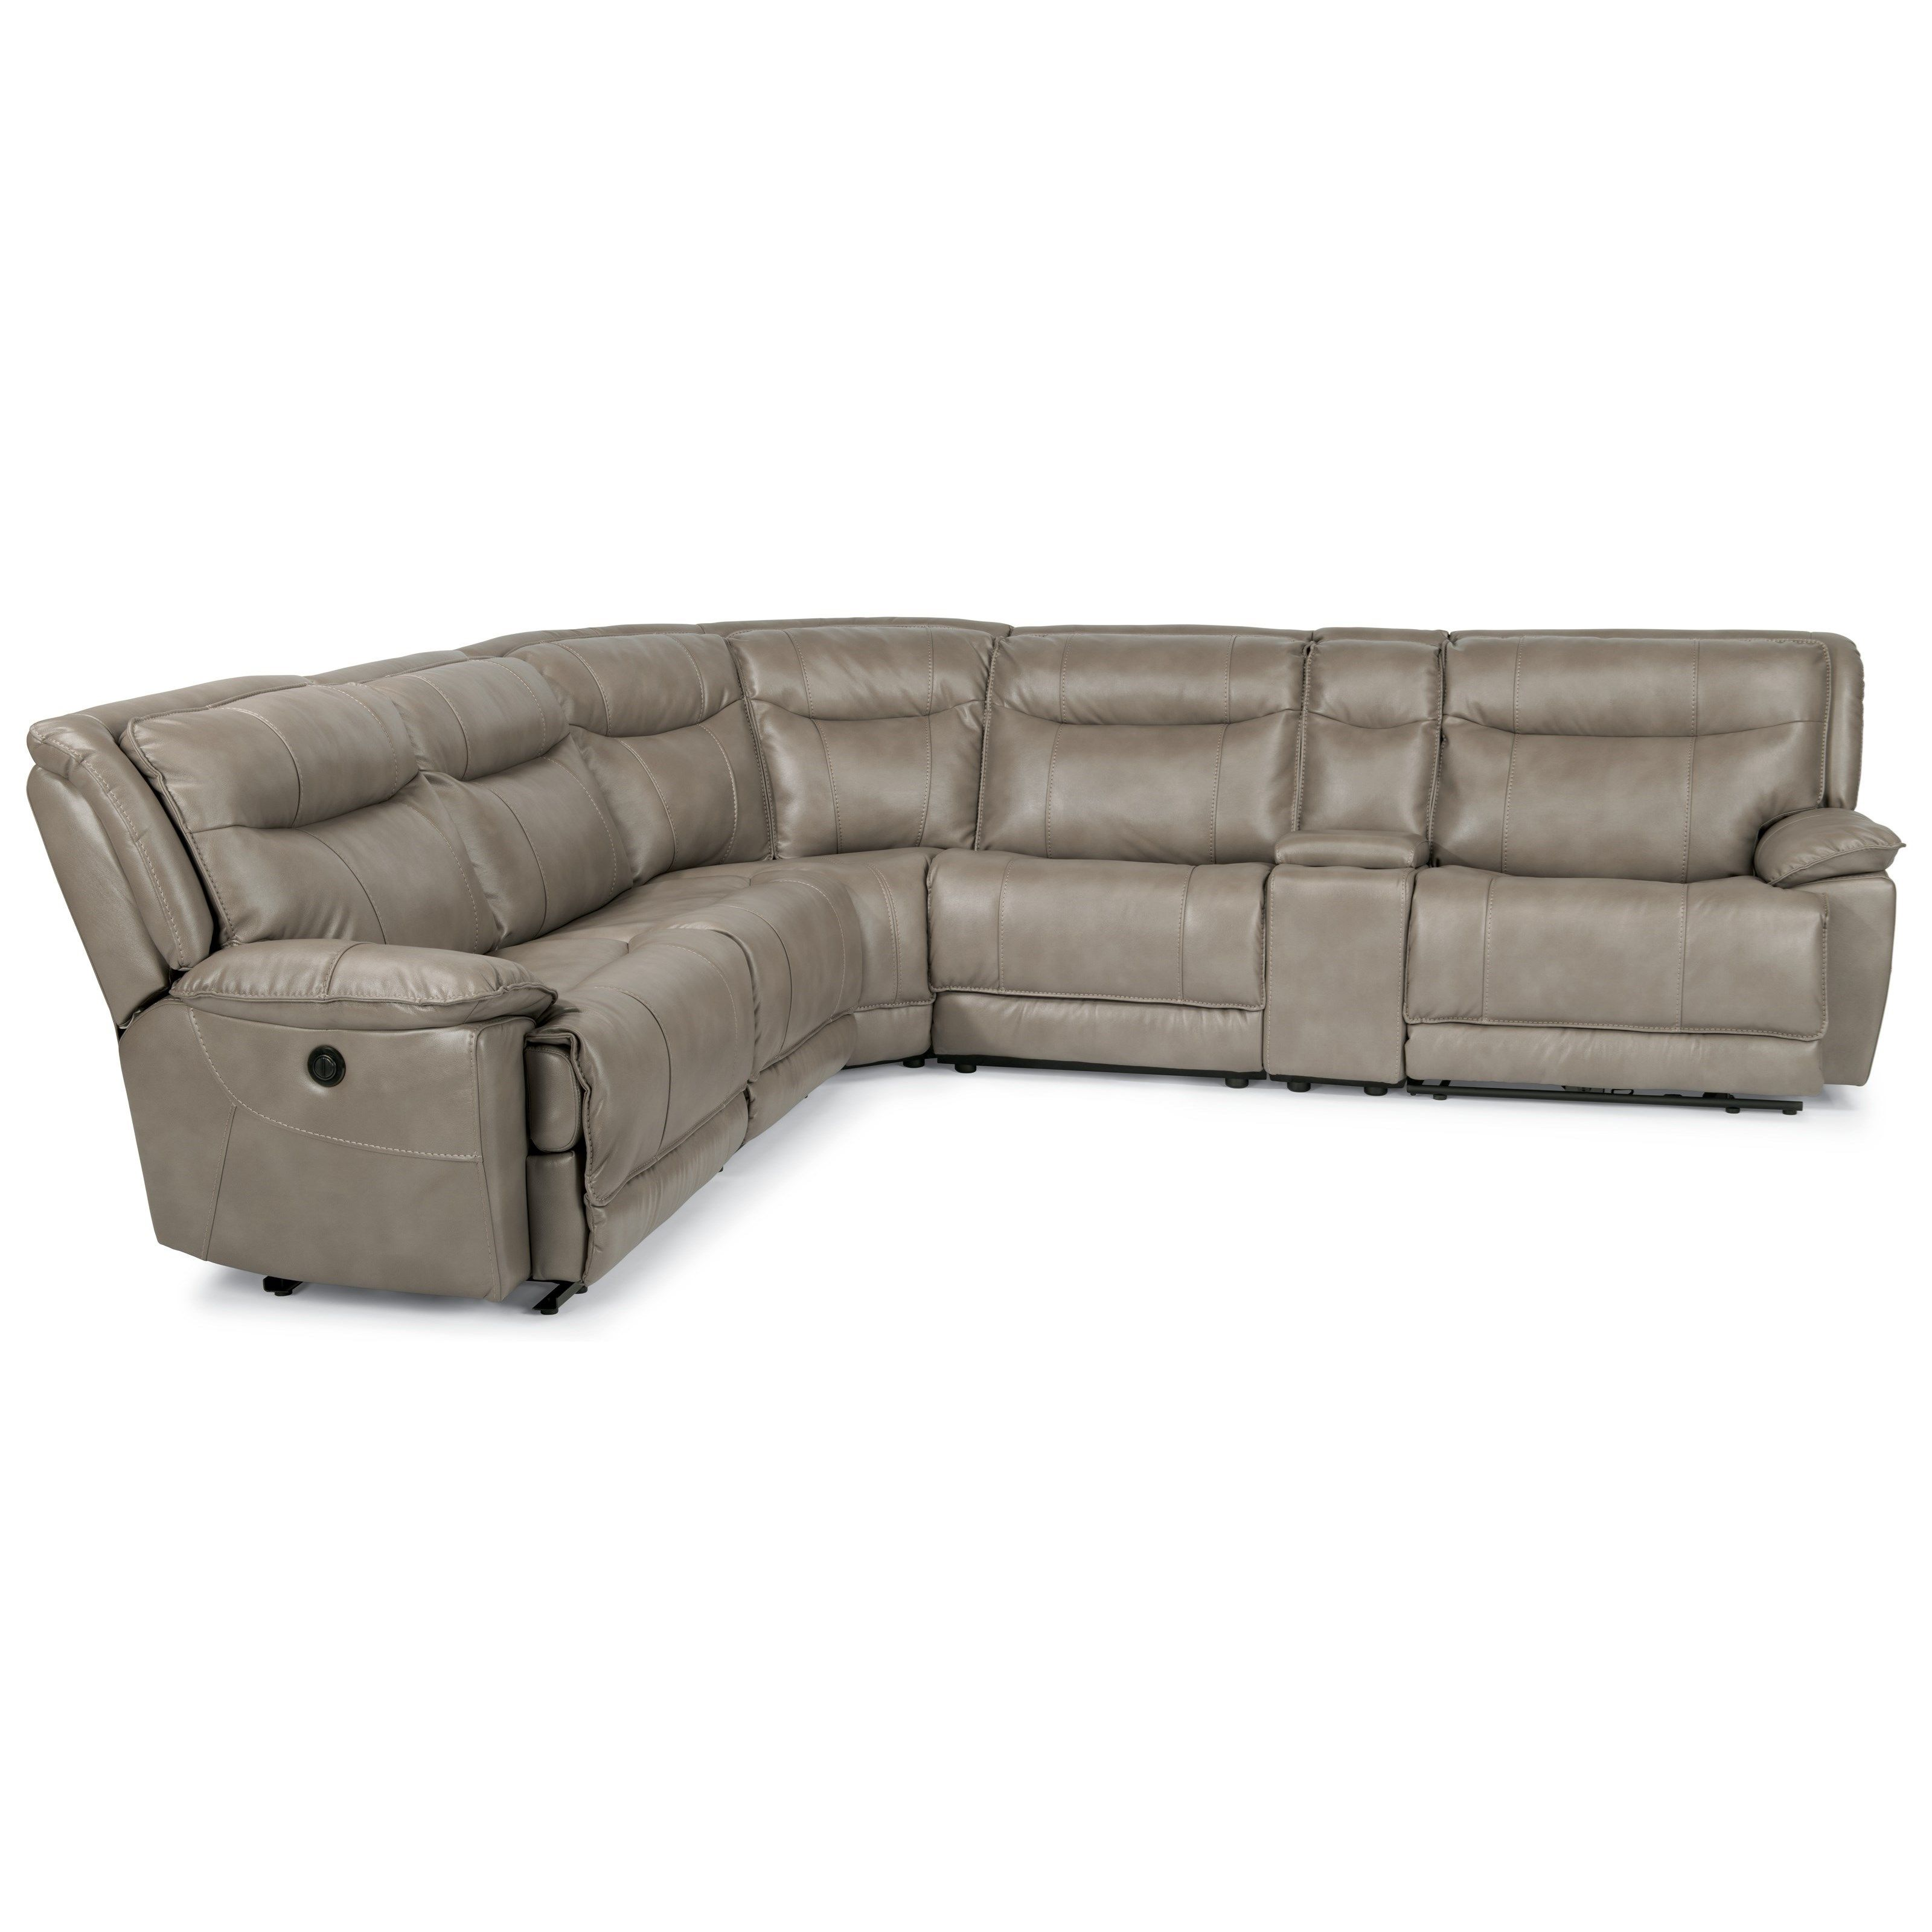 Tremendous Latitudes Bliss 6 Pc Reclining Sectional Sofa By Flexsteel Inzonedesignstudio Interior Chair Design Inzonedesignstudiocom